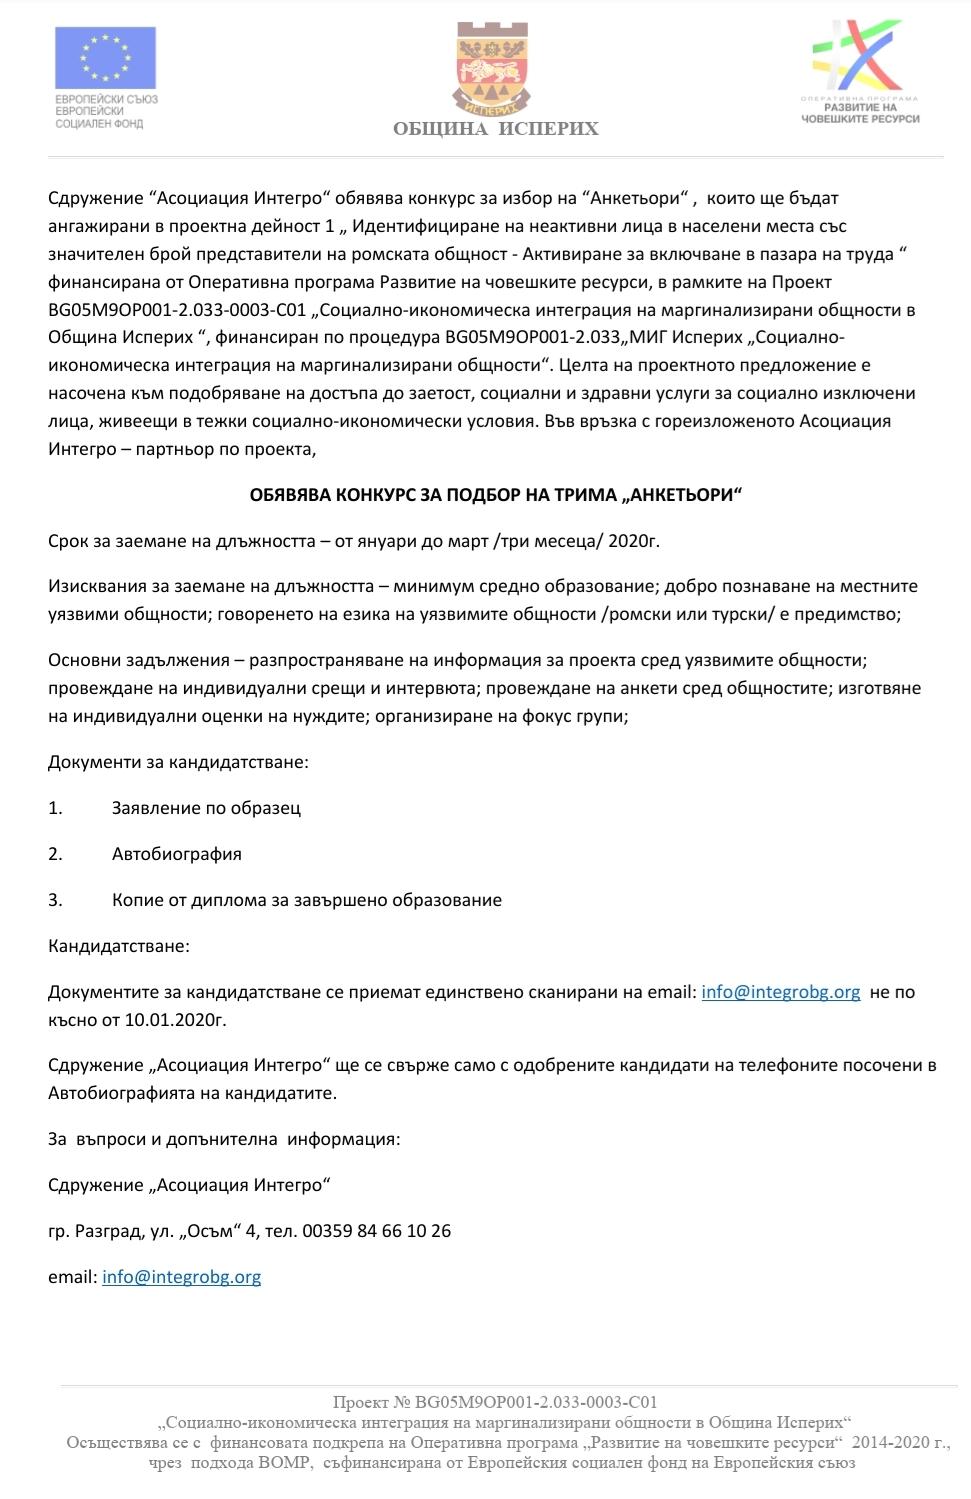 SmartSelect_20200717-145553_Office